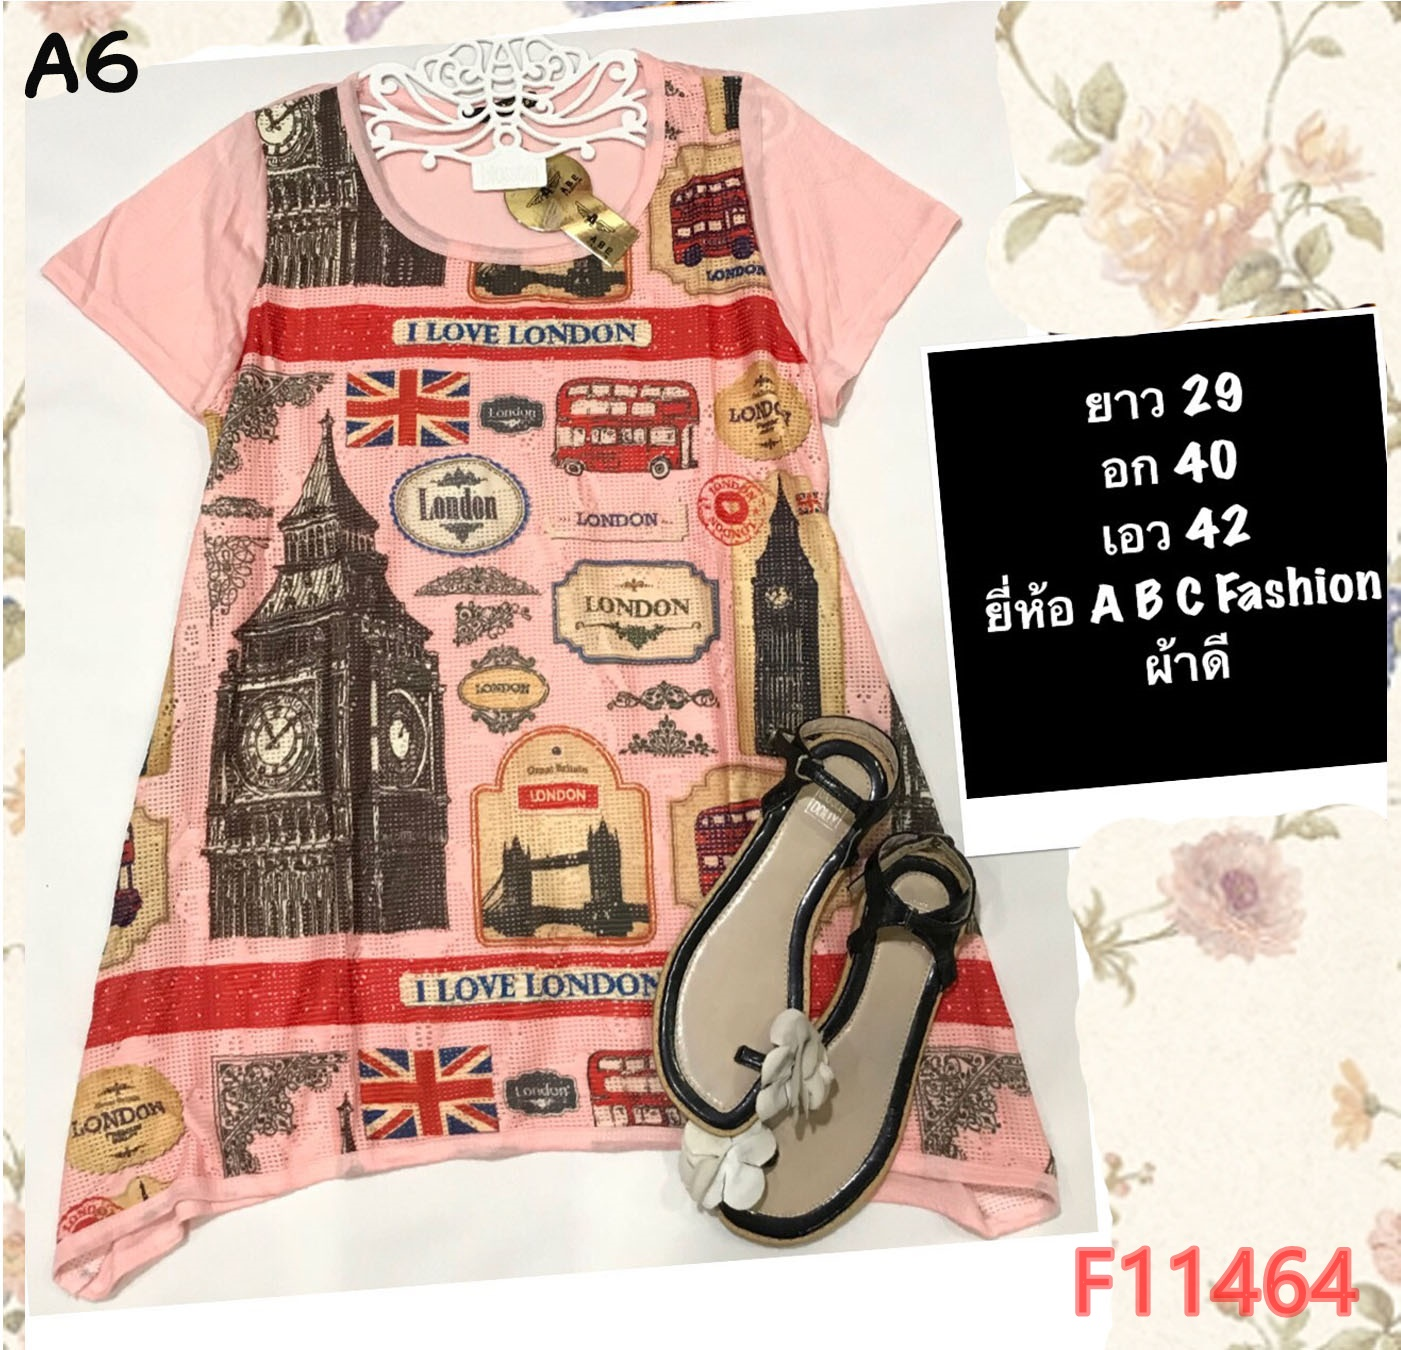 F11464 เสื้อยืดคอตตอนฉลุลาย ยี่ห้อ ABC Fashion สีโอรส